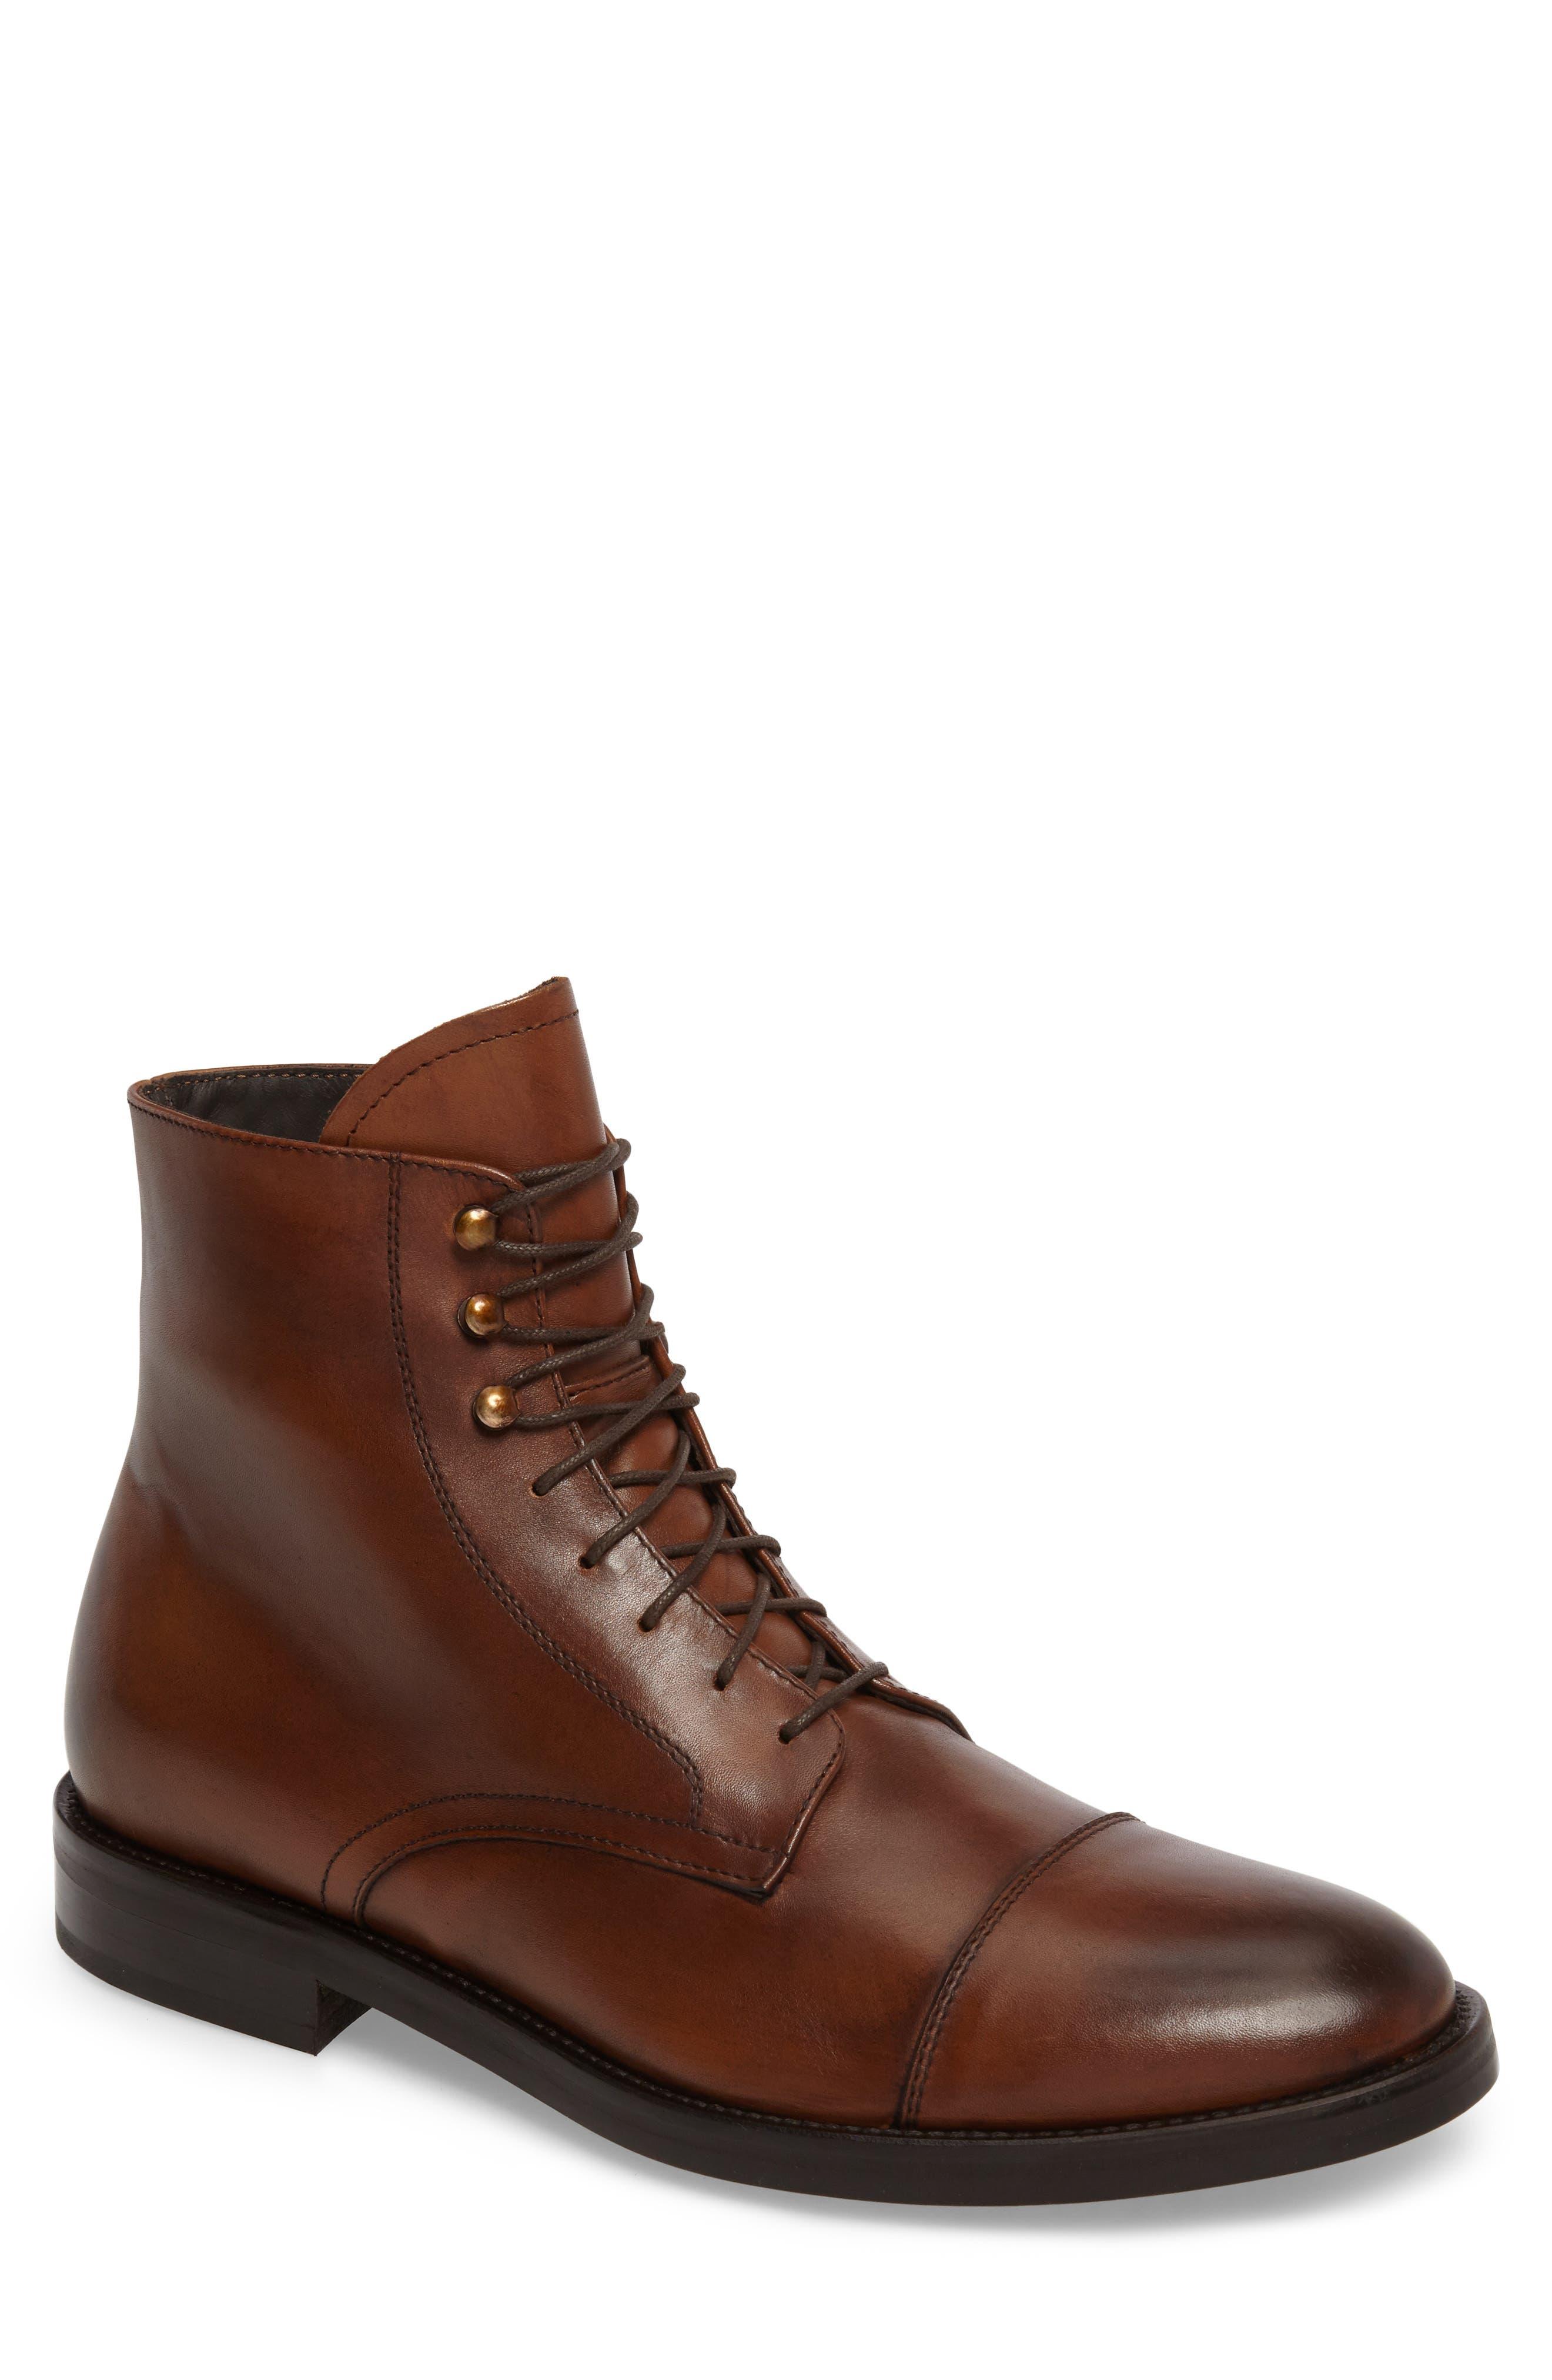 Main Image - To Boot New York Henri Cap Toe Boot (Men)